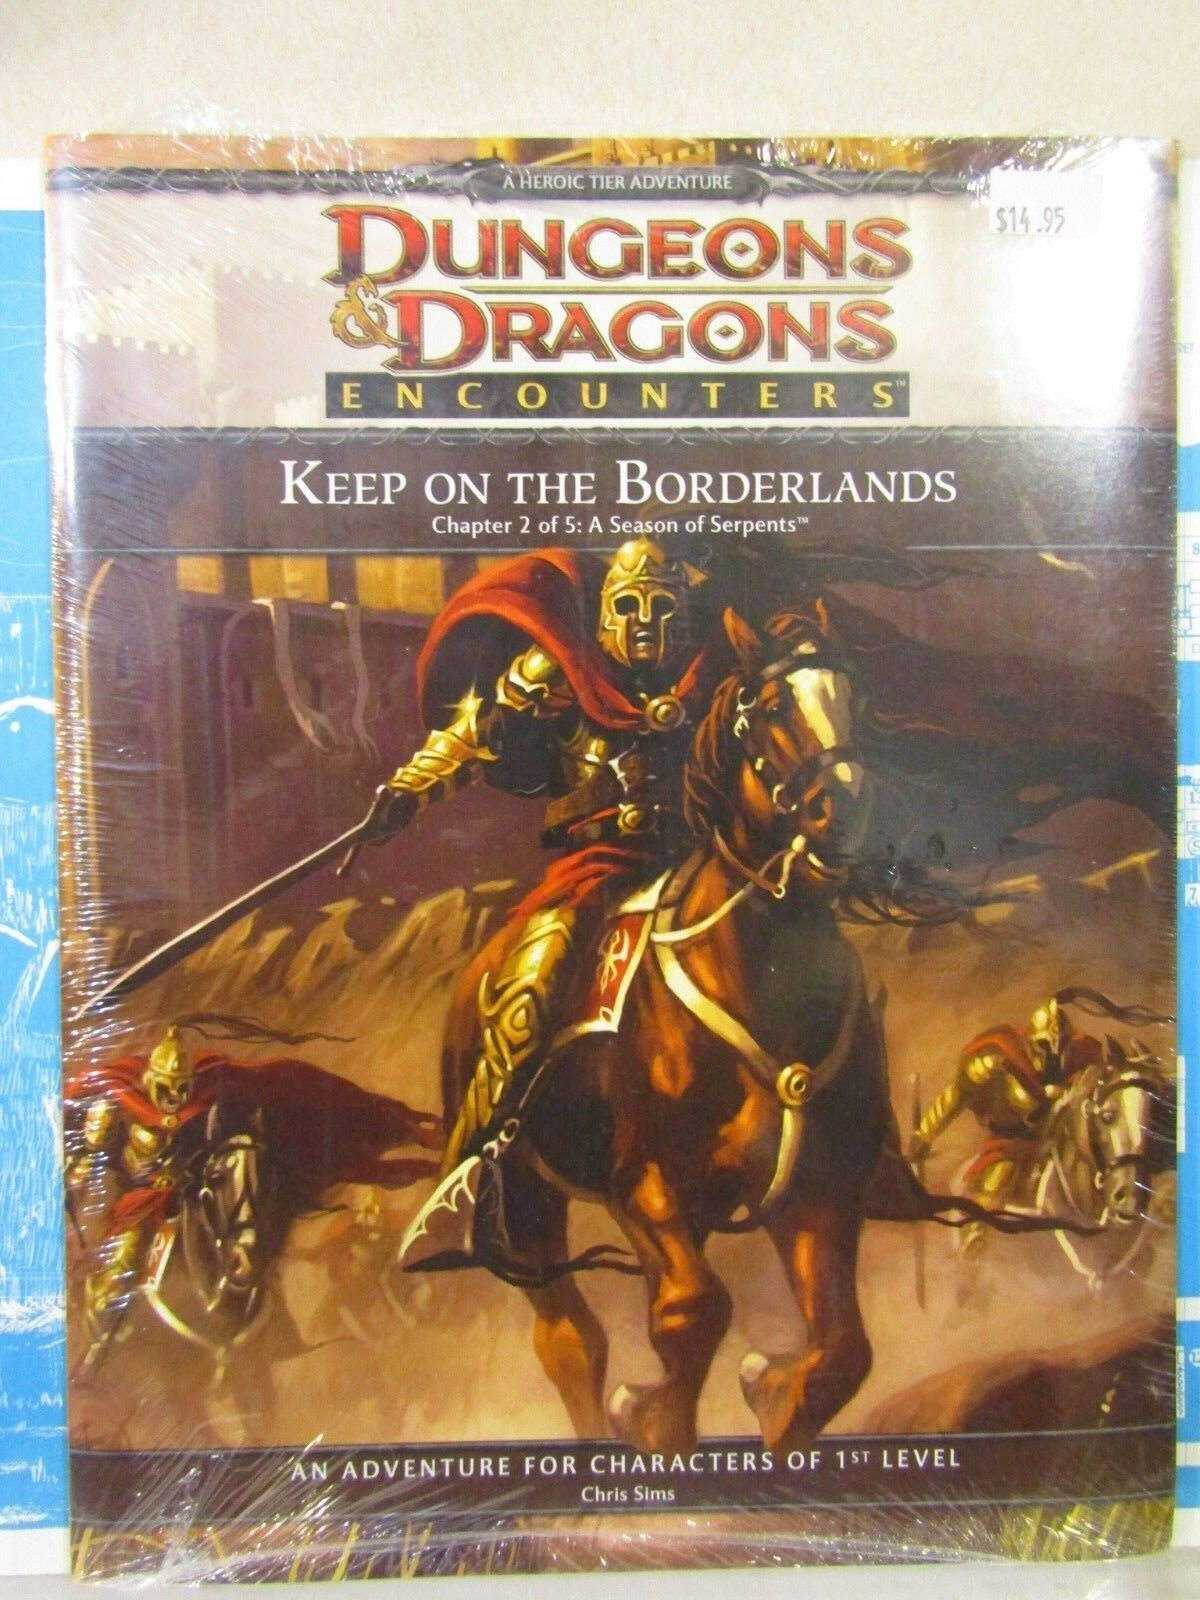 Dungeons & Dragons Keep on the Borderlands Chapter 2 shrinkwrap   SW